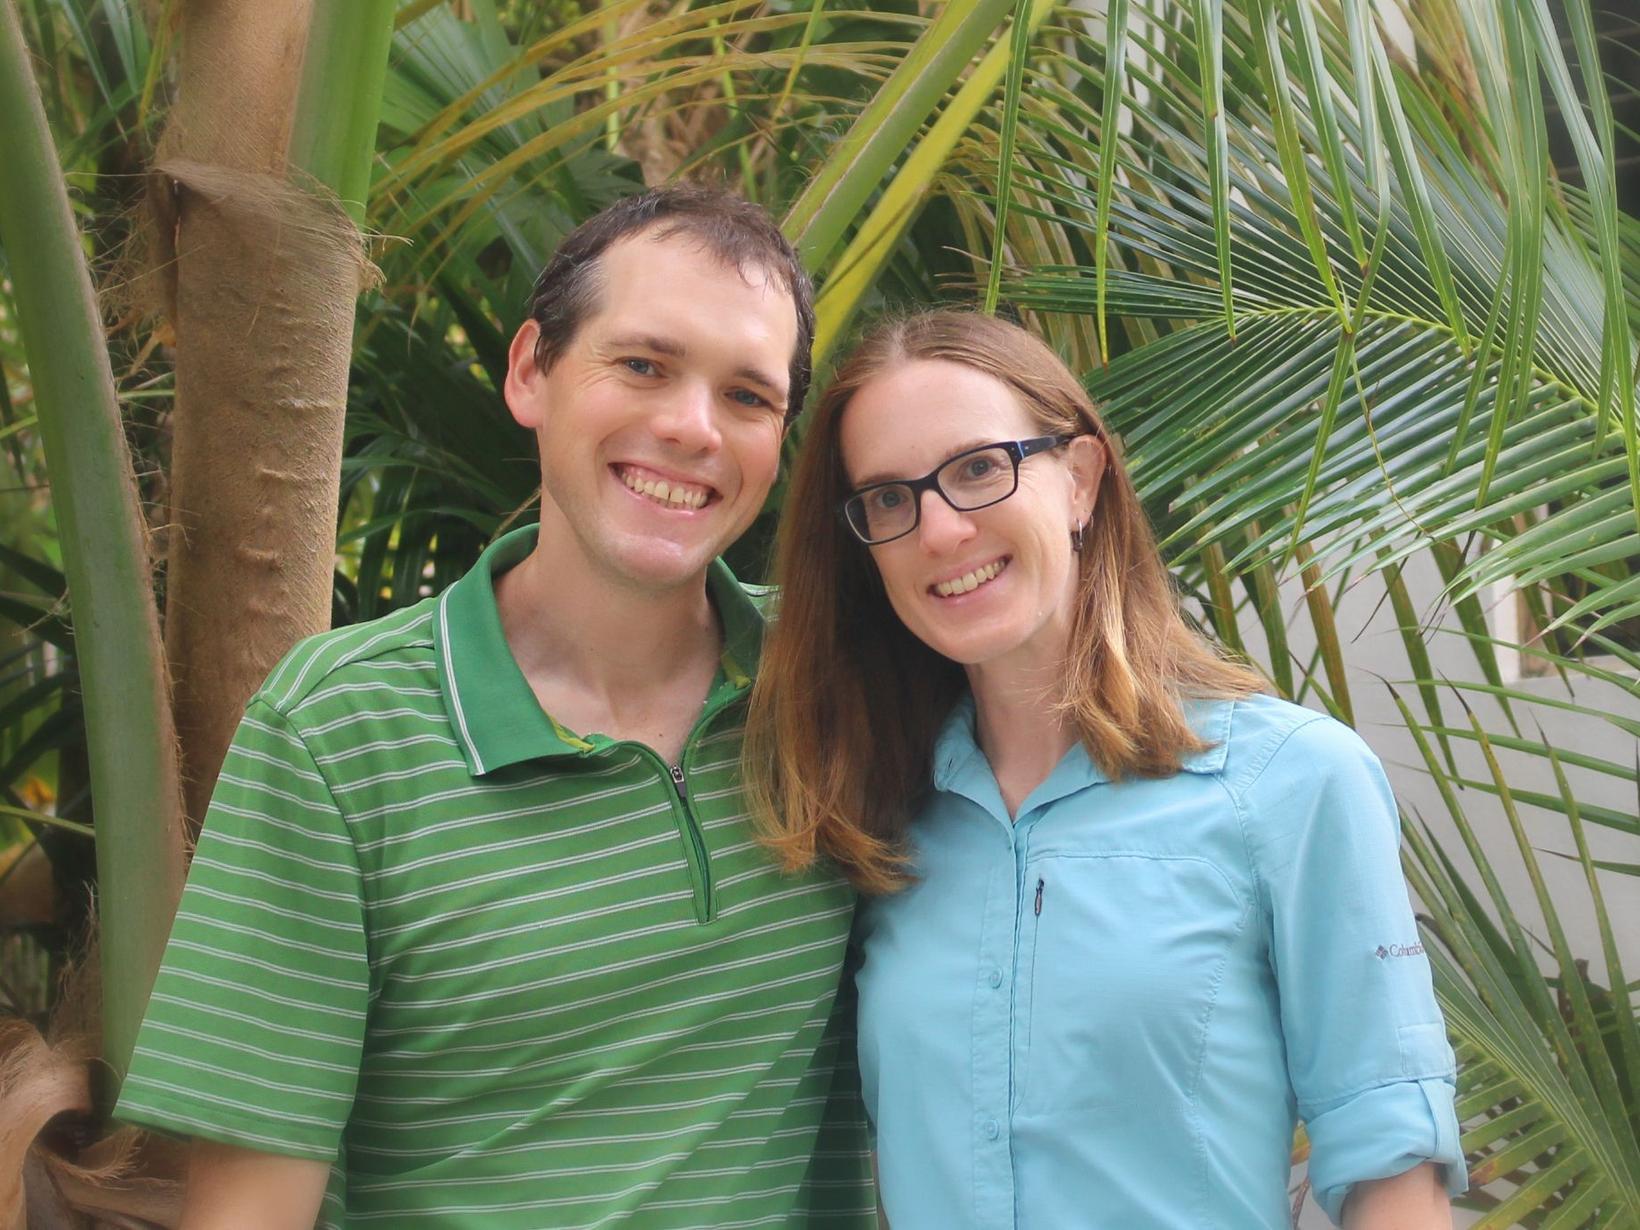 Heather & Tim from Halifax, Nova Scotia, Canada